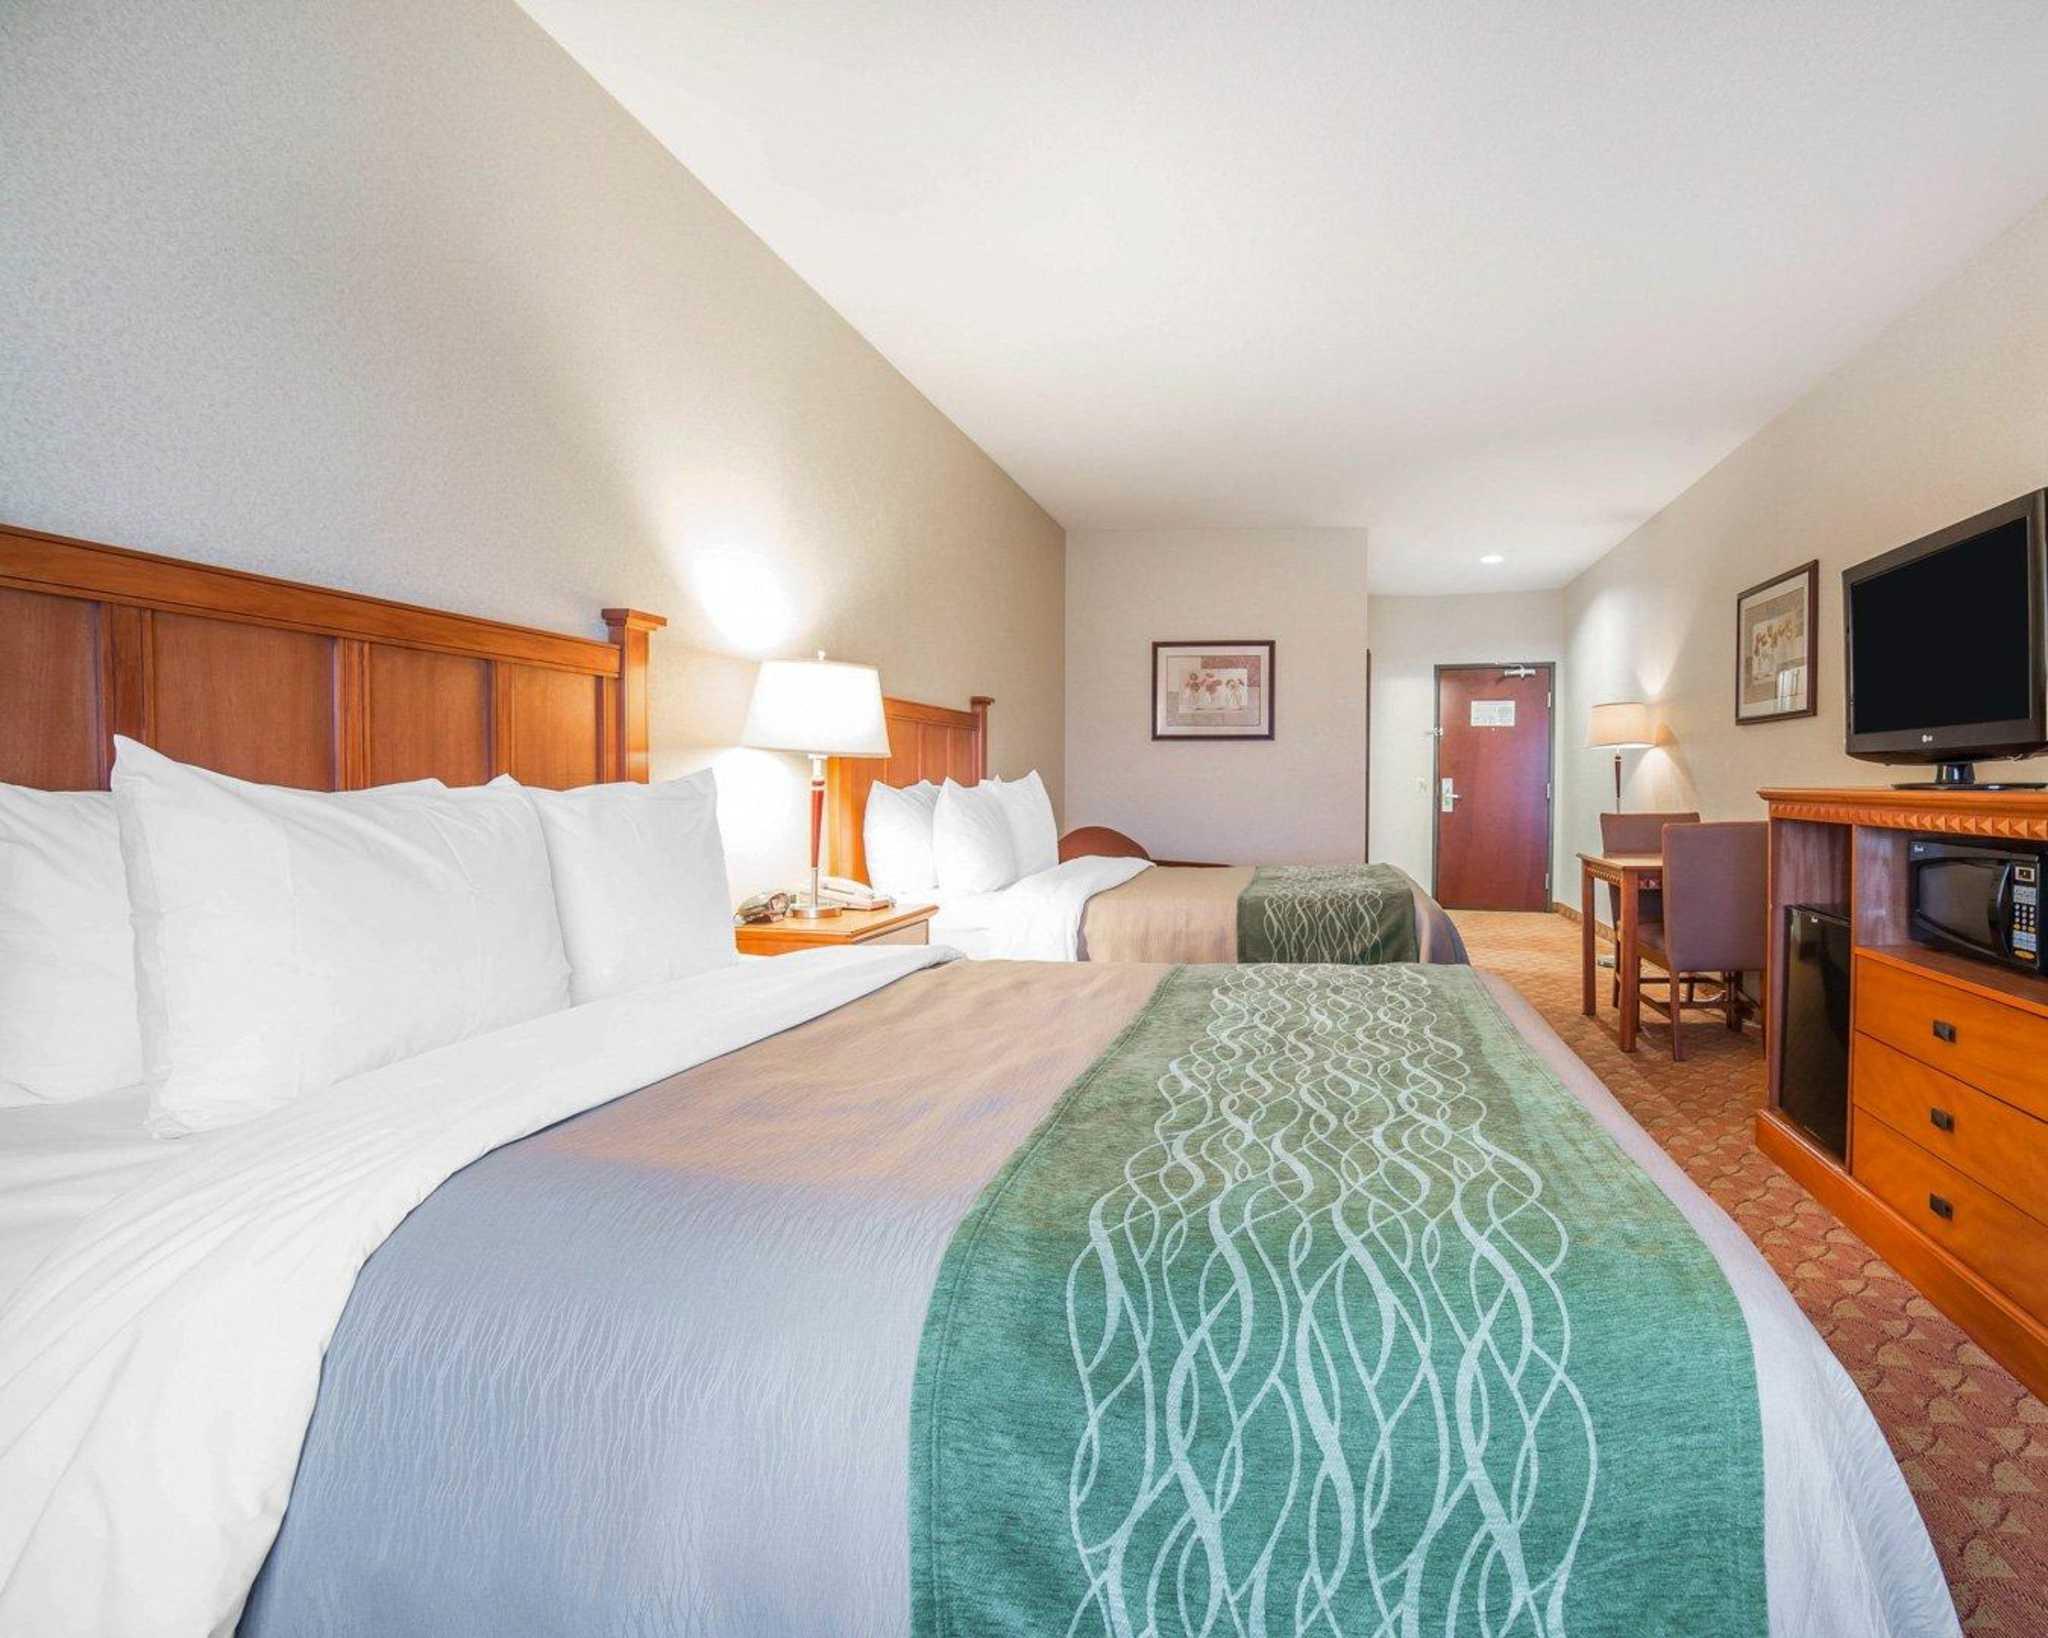 Comfort Inn & Suites Las Vegas - Nellis image 14